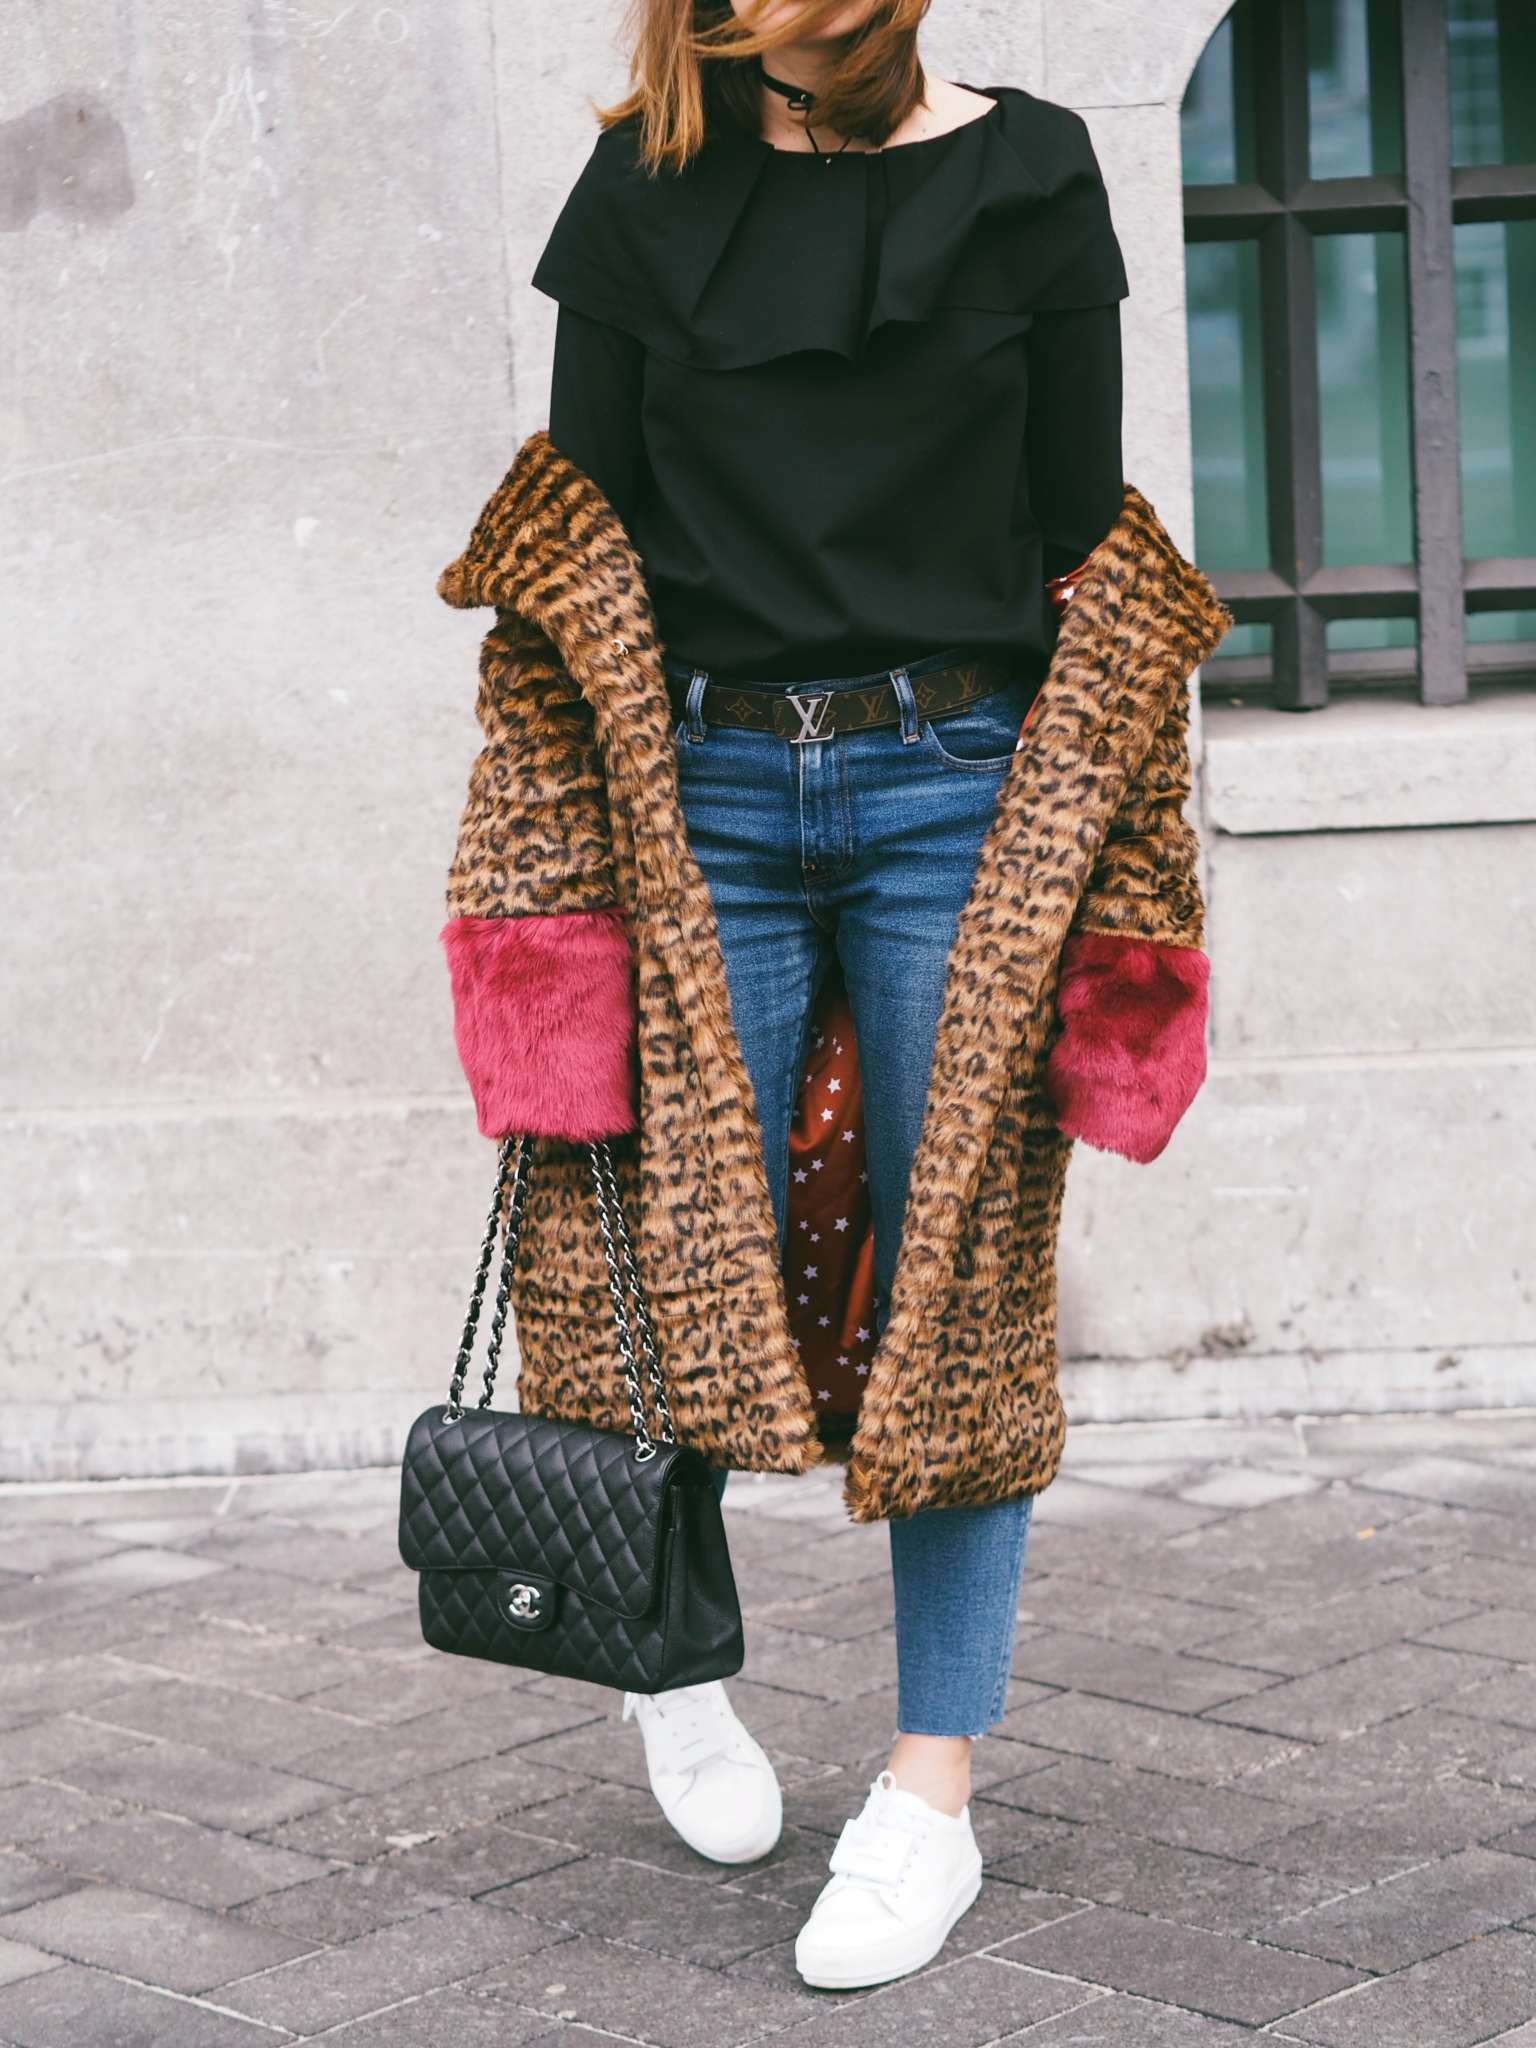 nickyinsideout - leopard print - new year resolutions - fall winter  inspiration - Etsy ... 3fcb4eeba